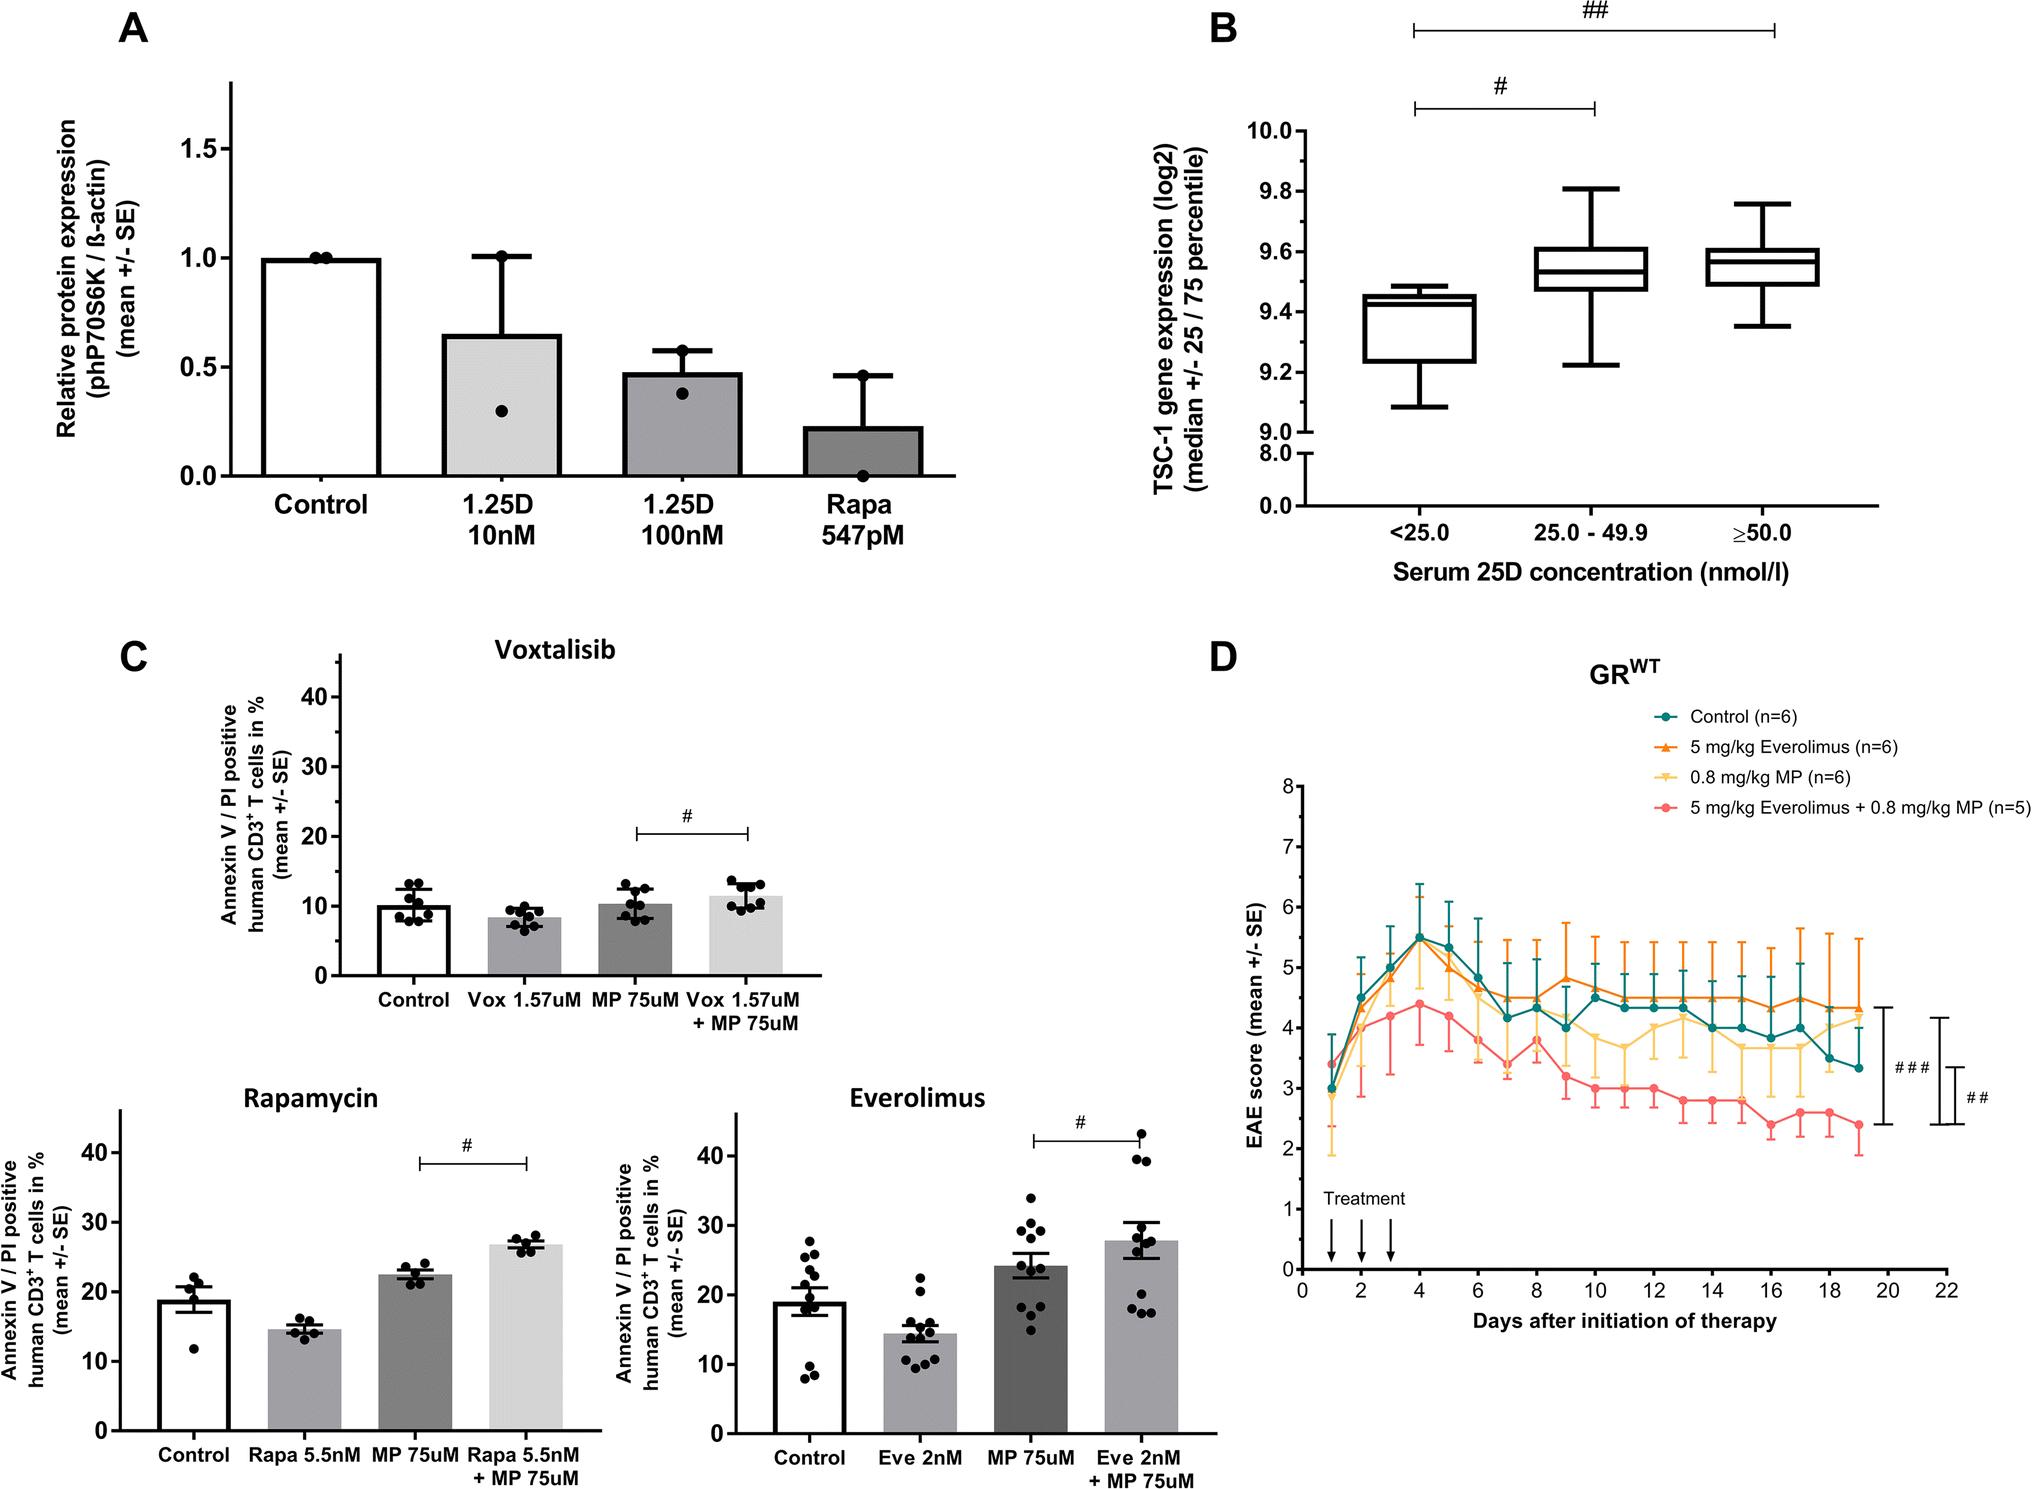 Vitamin D increases glucocorticoid efficacy via inhibition